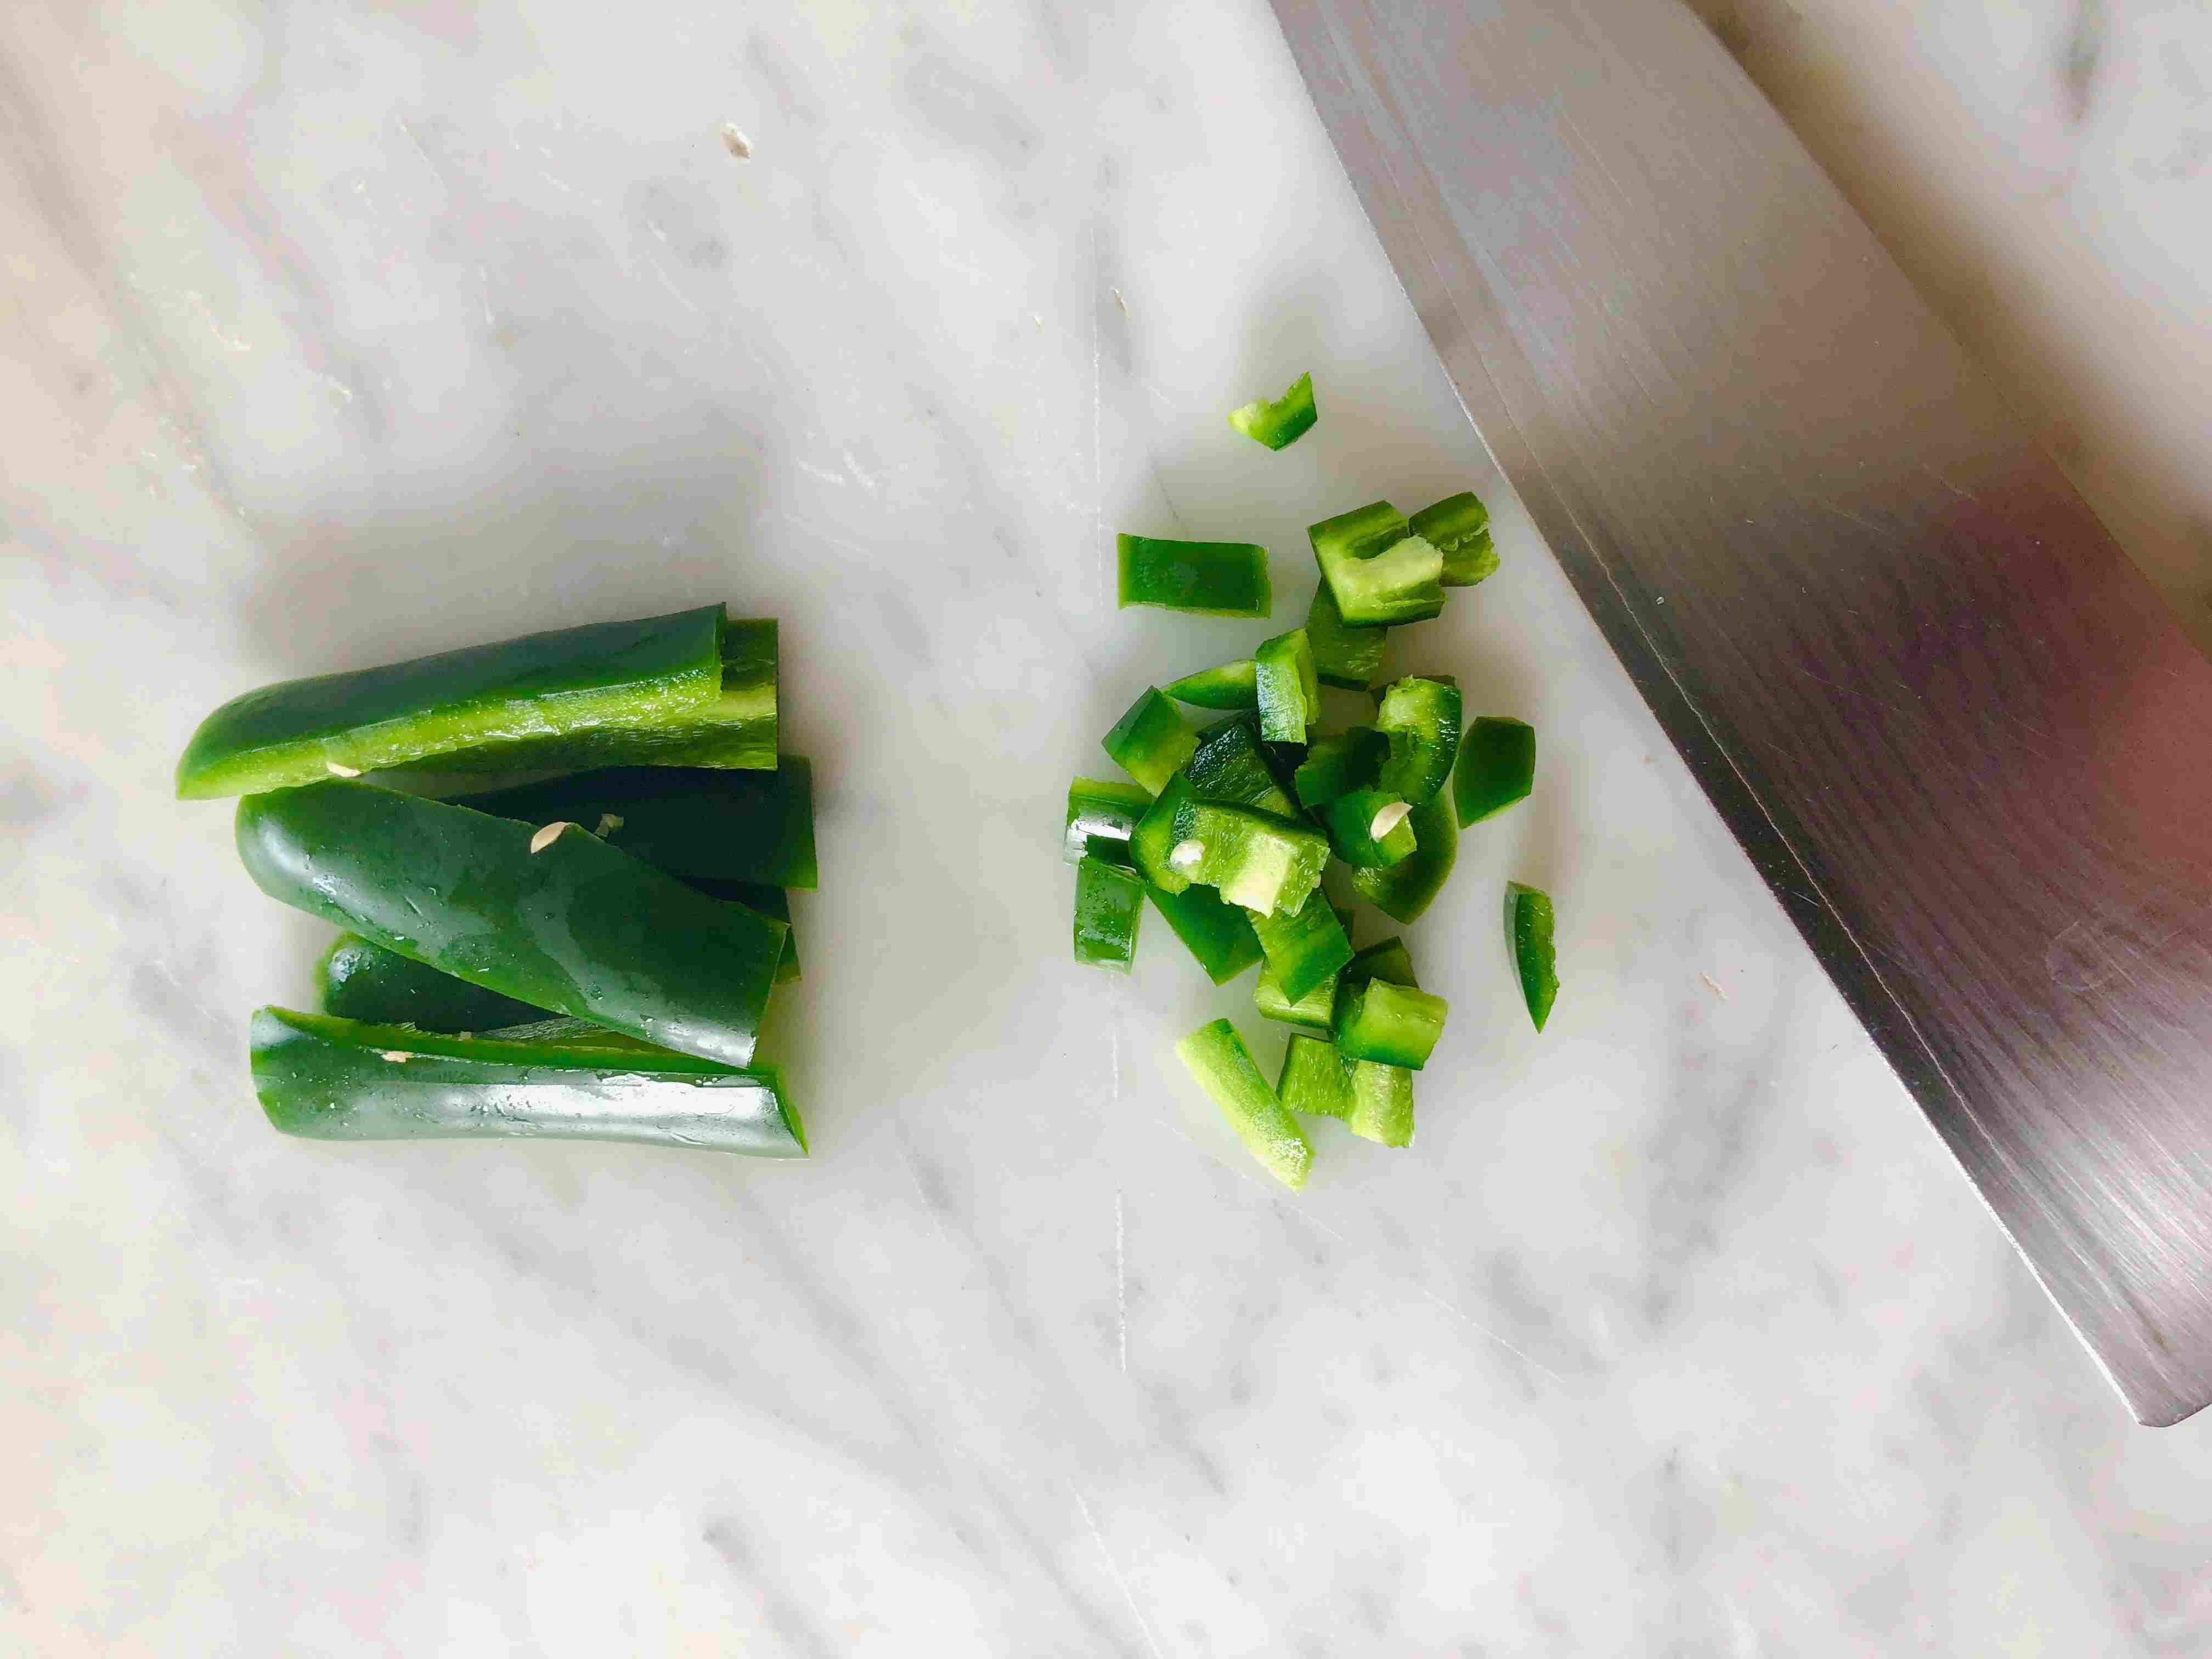 Chopping Chiles